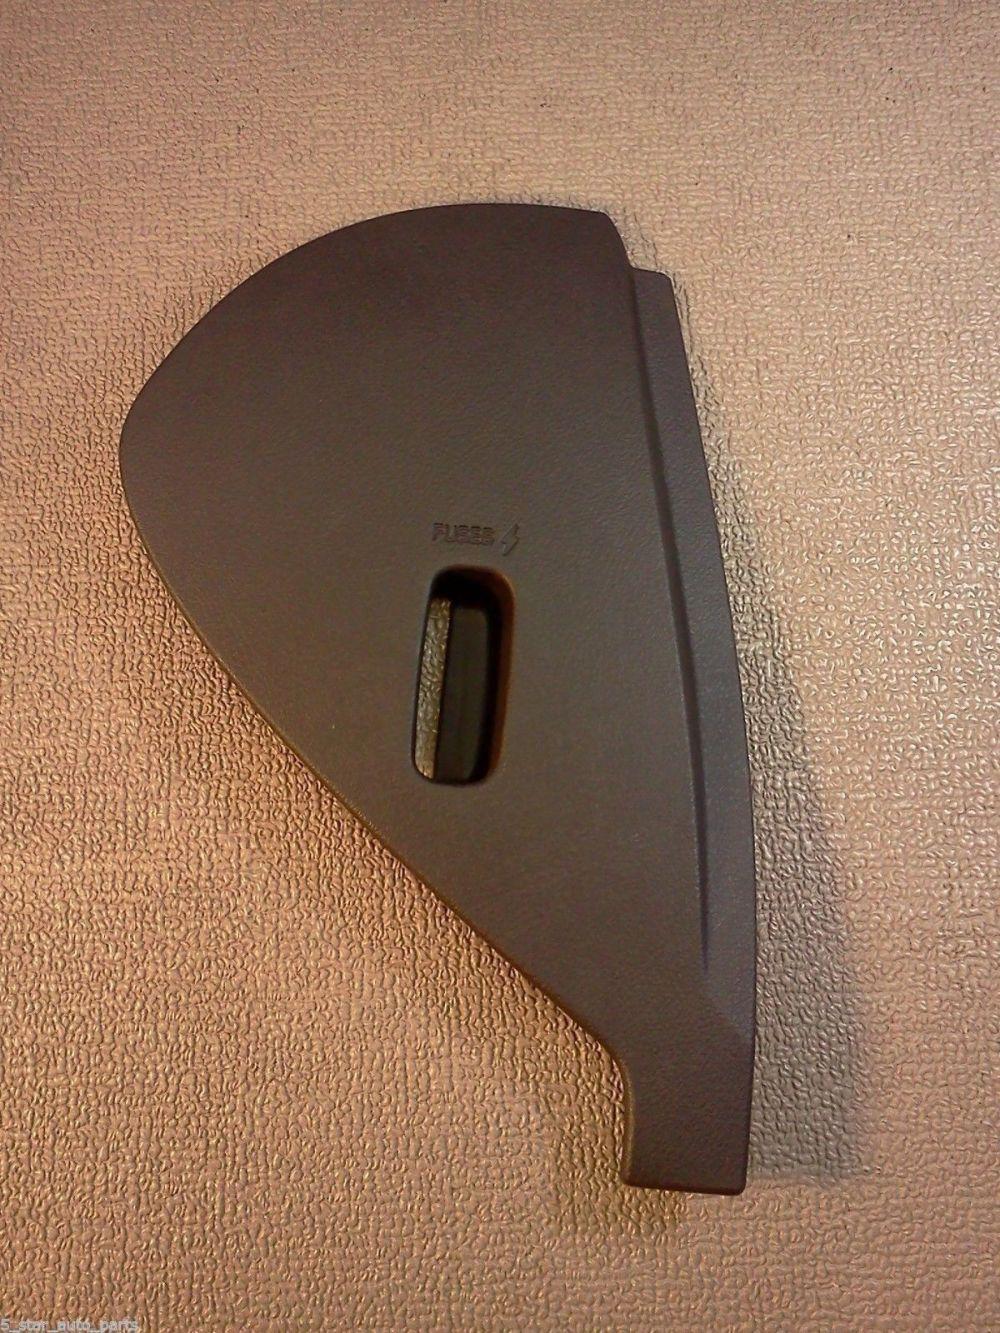 medium resolution of 2014 buick lucerne fuse box